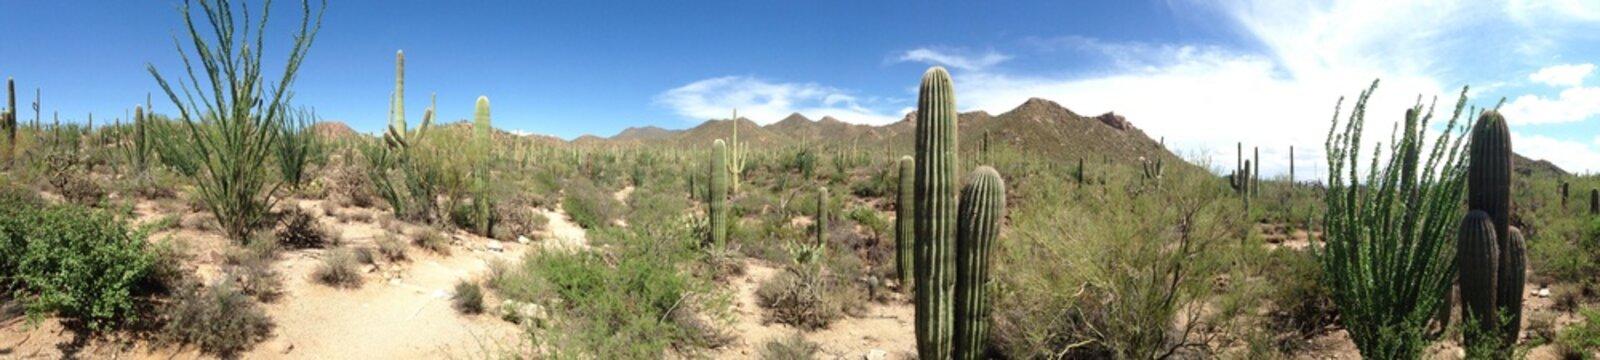 vista paesaggio desertico